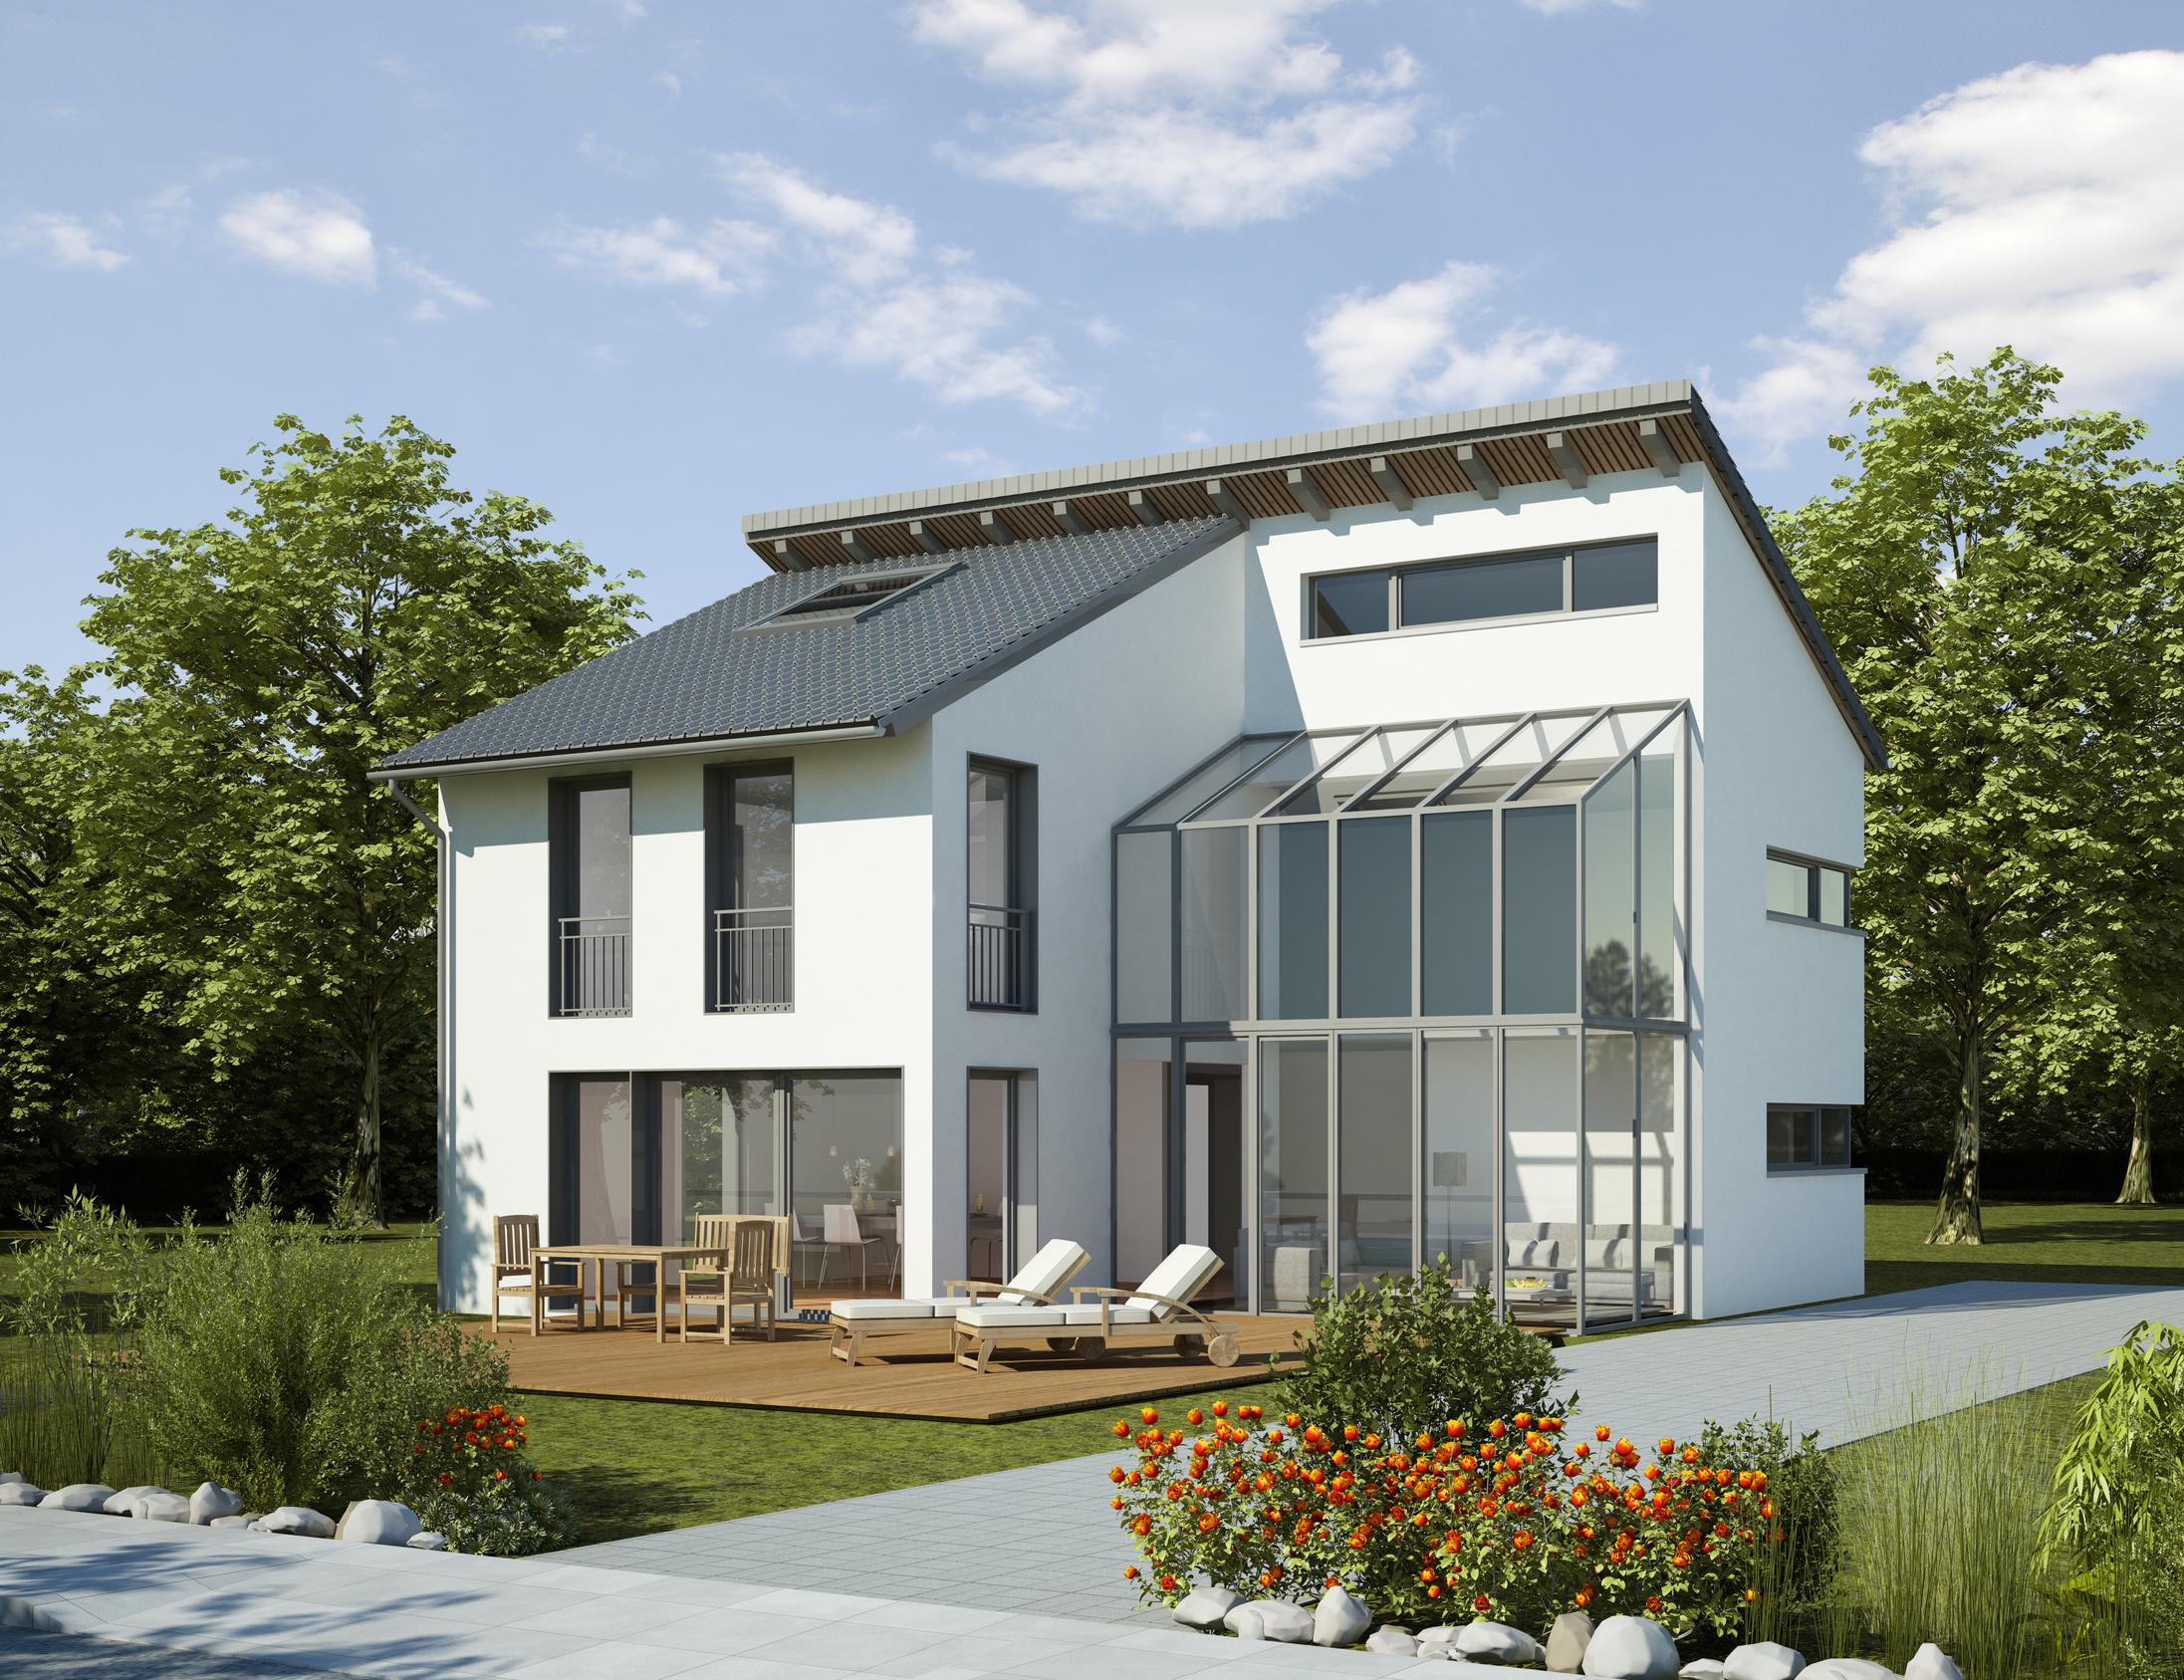 mg bauelemente fenster t ren garagentore wintergarten. Black Bedroom Furniture Sets. Home Design Ideas